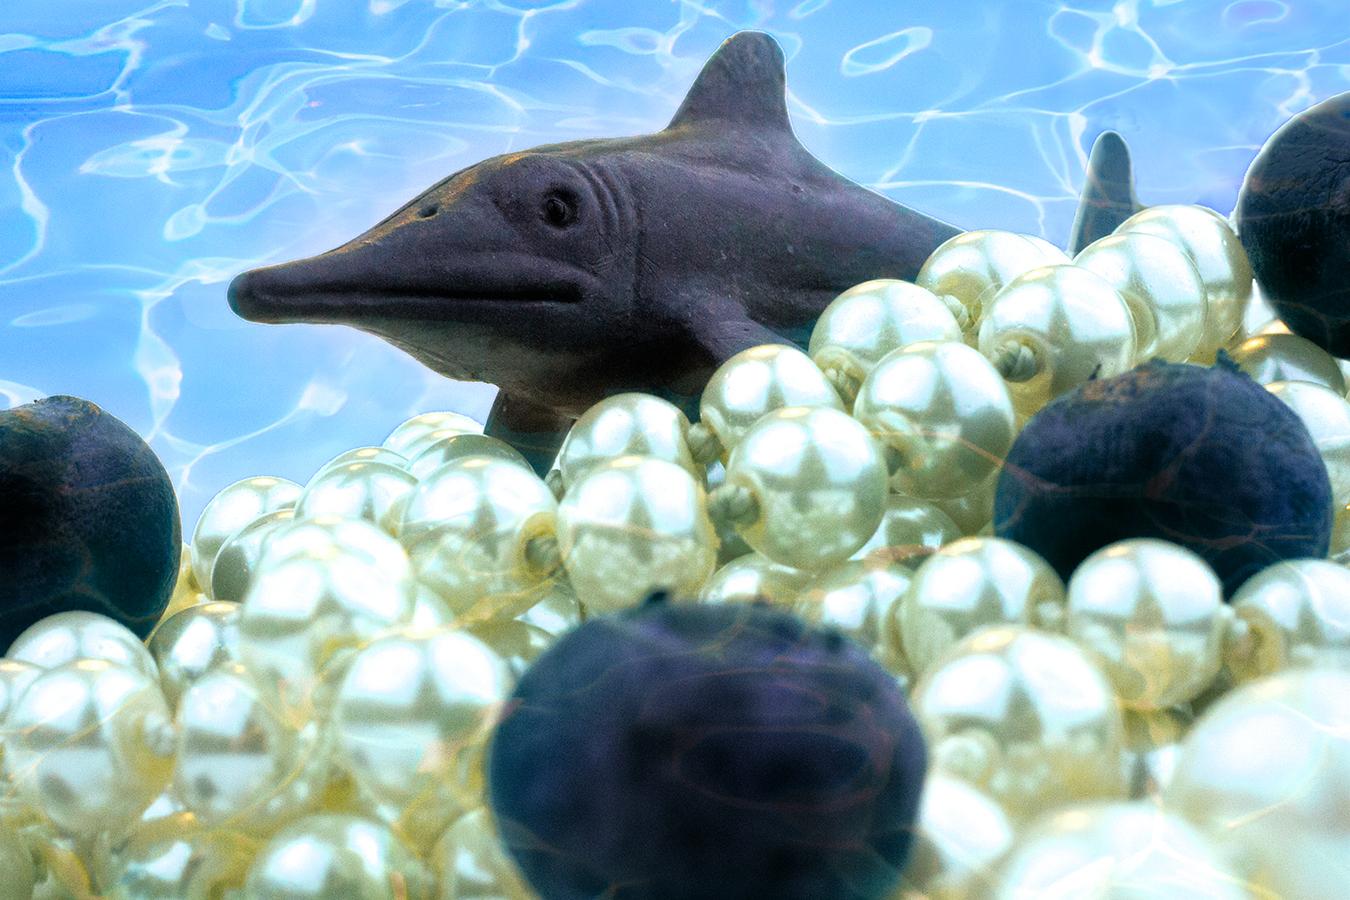 Victoria_Meng_Project2_Violet_Shark_Dinosaur_Pearls_Underwater_Blueberries_HDR